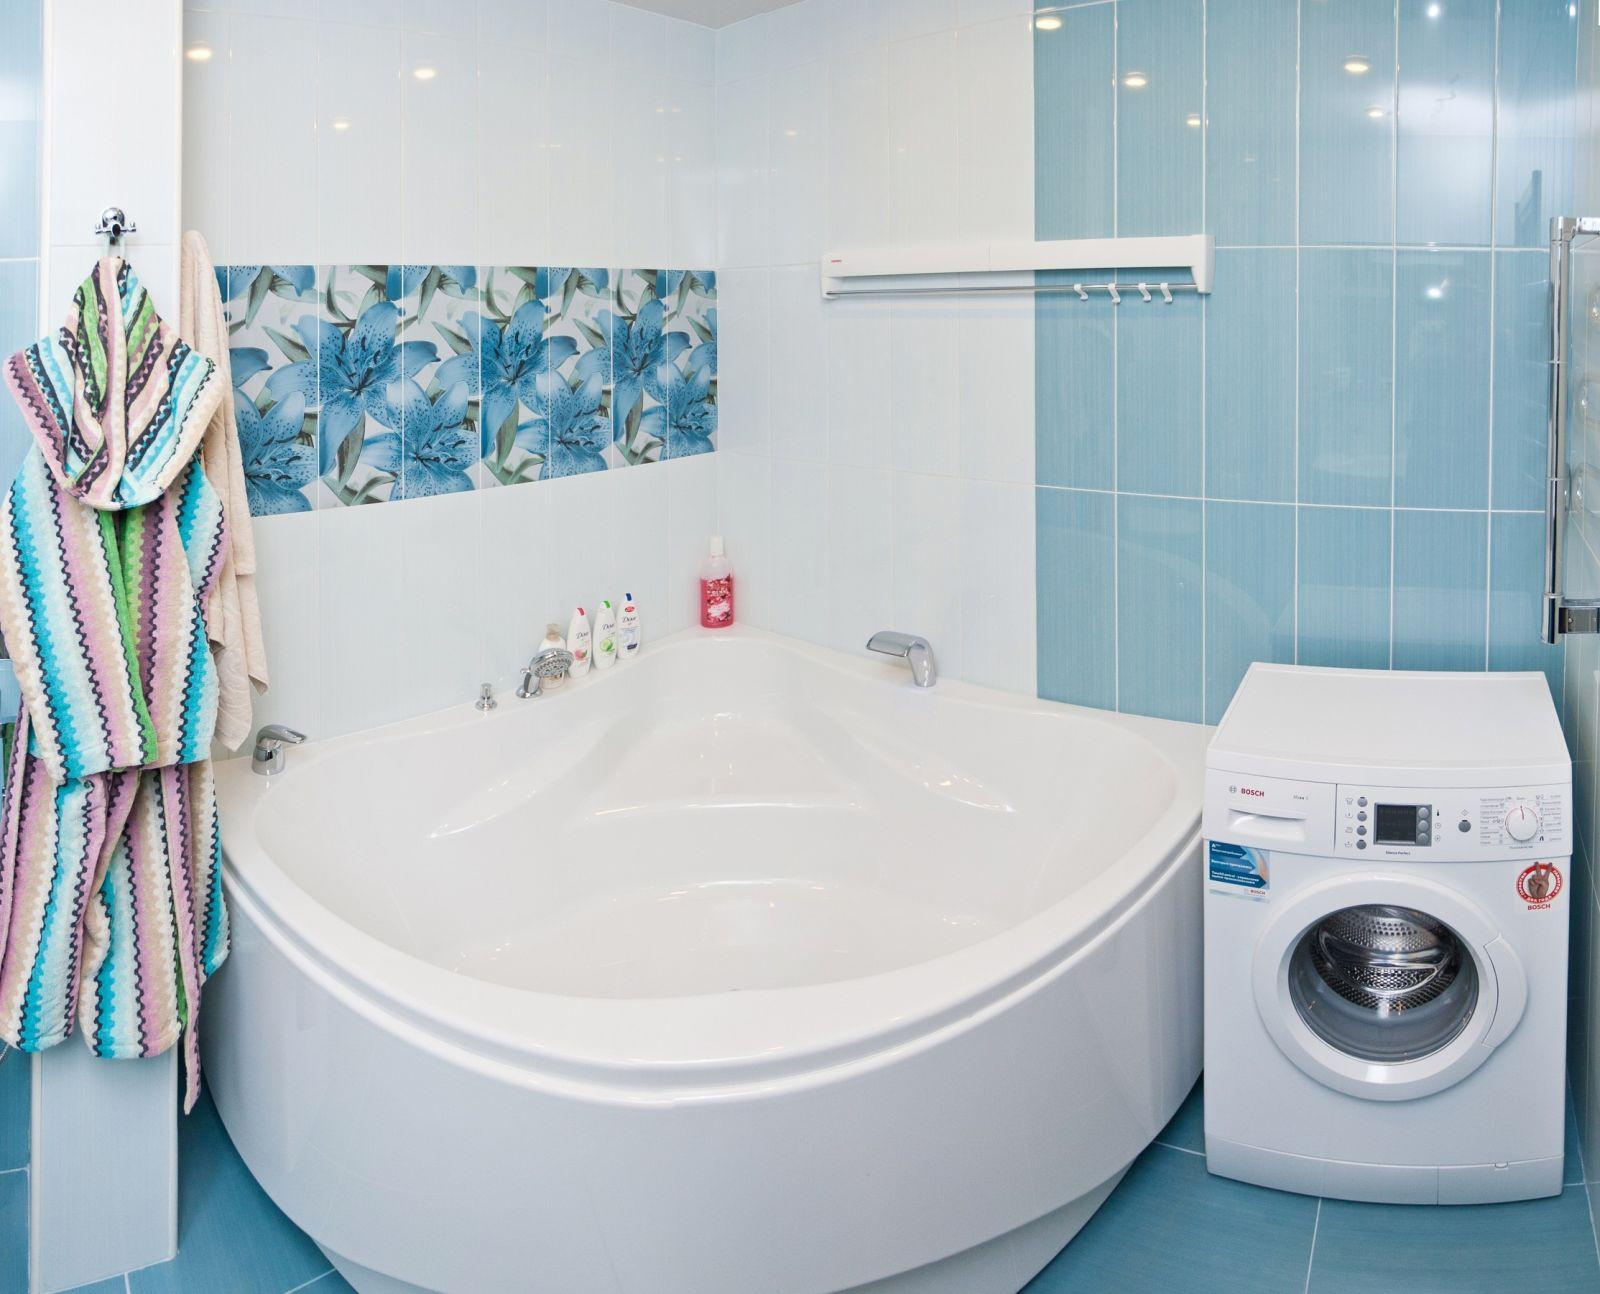 Ванная комната дизайн фото голубая